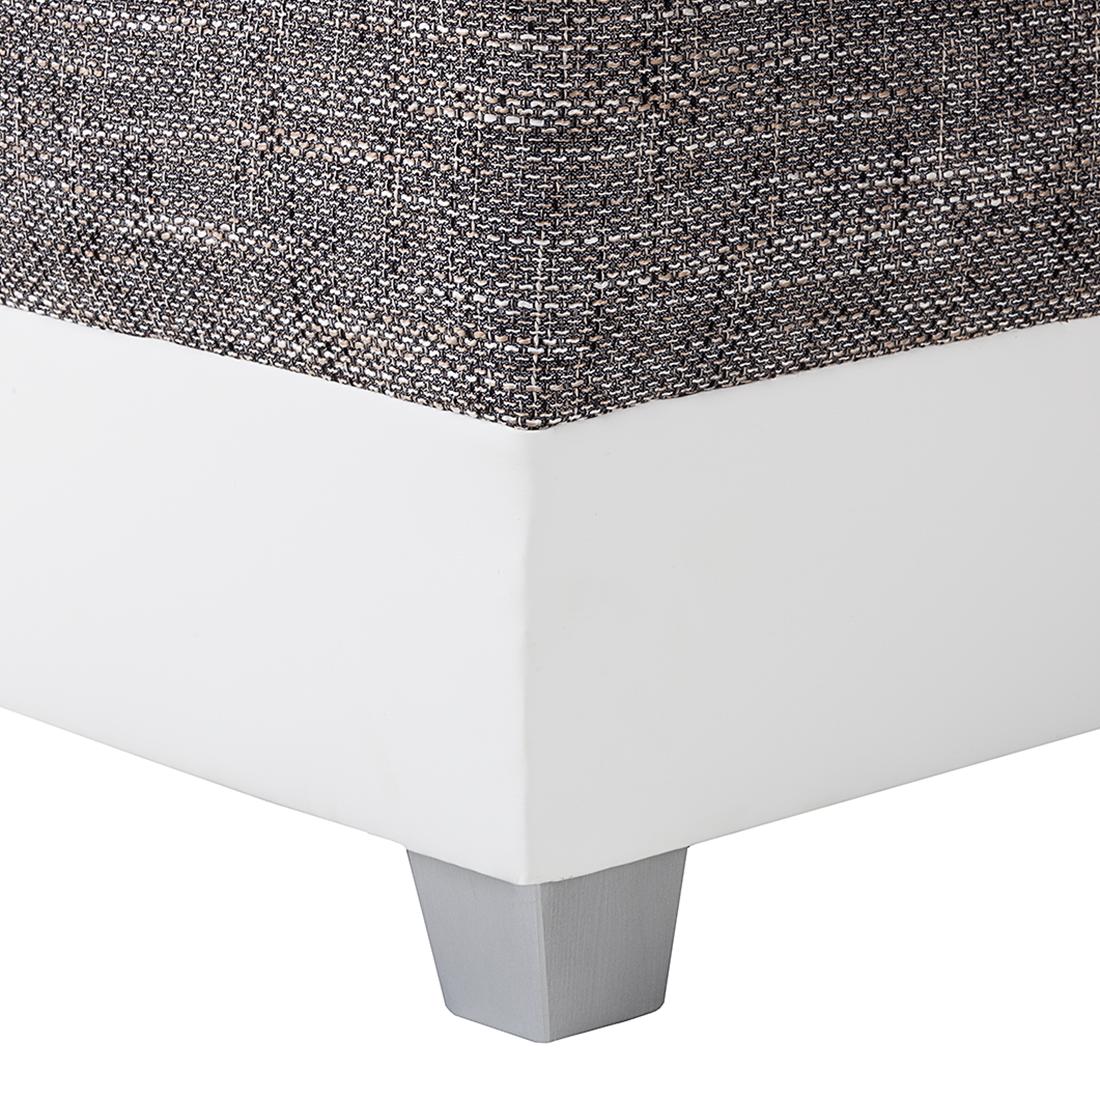 ecksofa stoff grau wei schlafsofa schlafcouch sofa couch. Black Bedroom Furniture Sets. Home Design Ideas